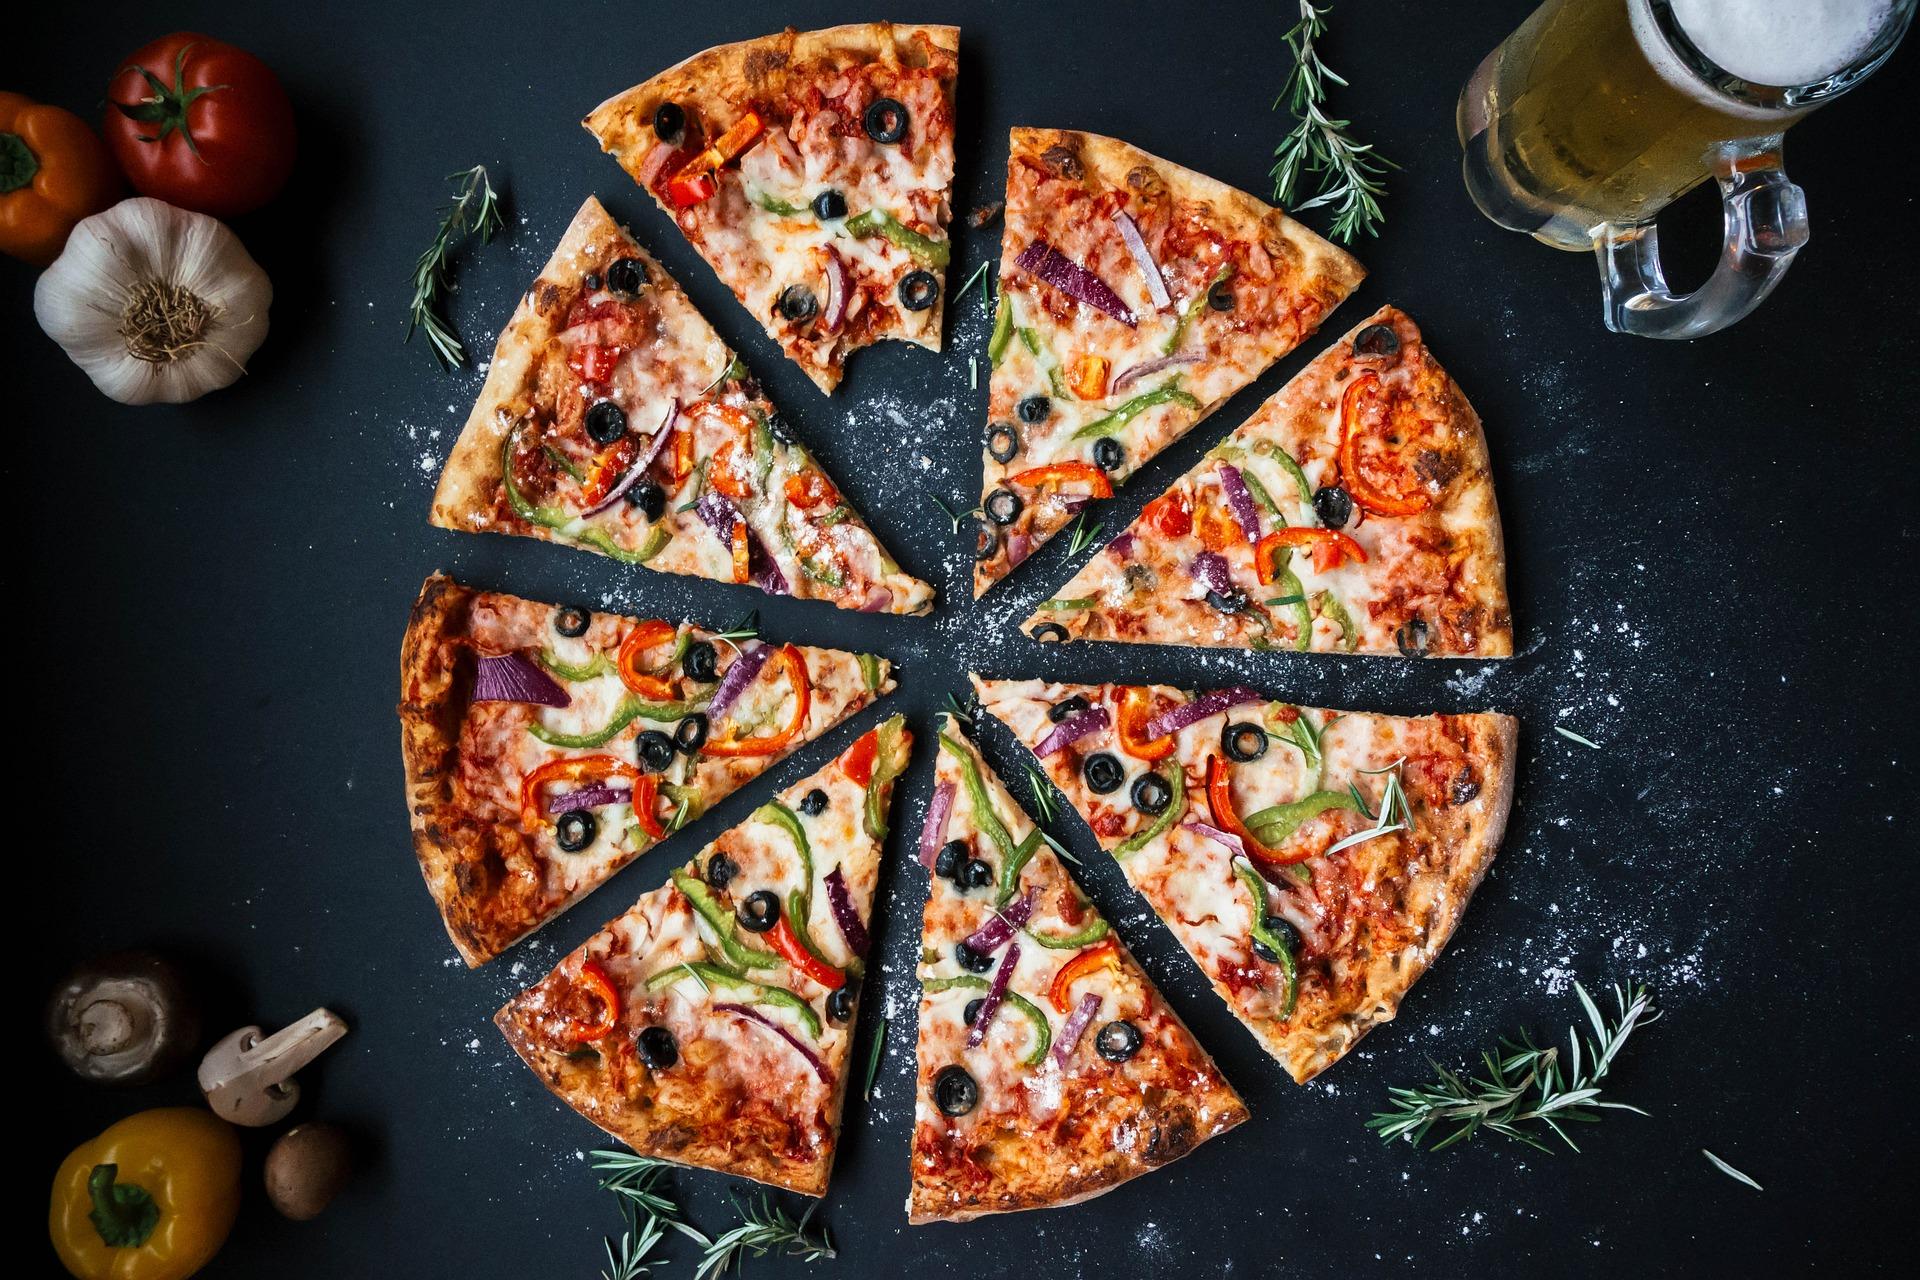 Pizzeria Sam Pizzas